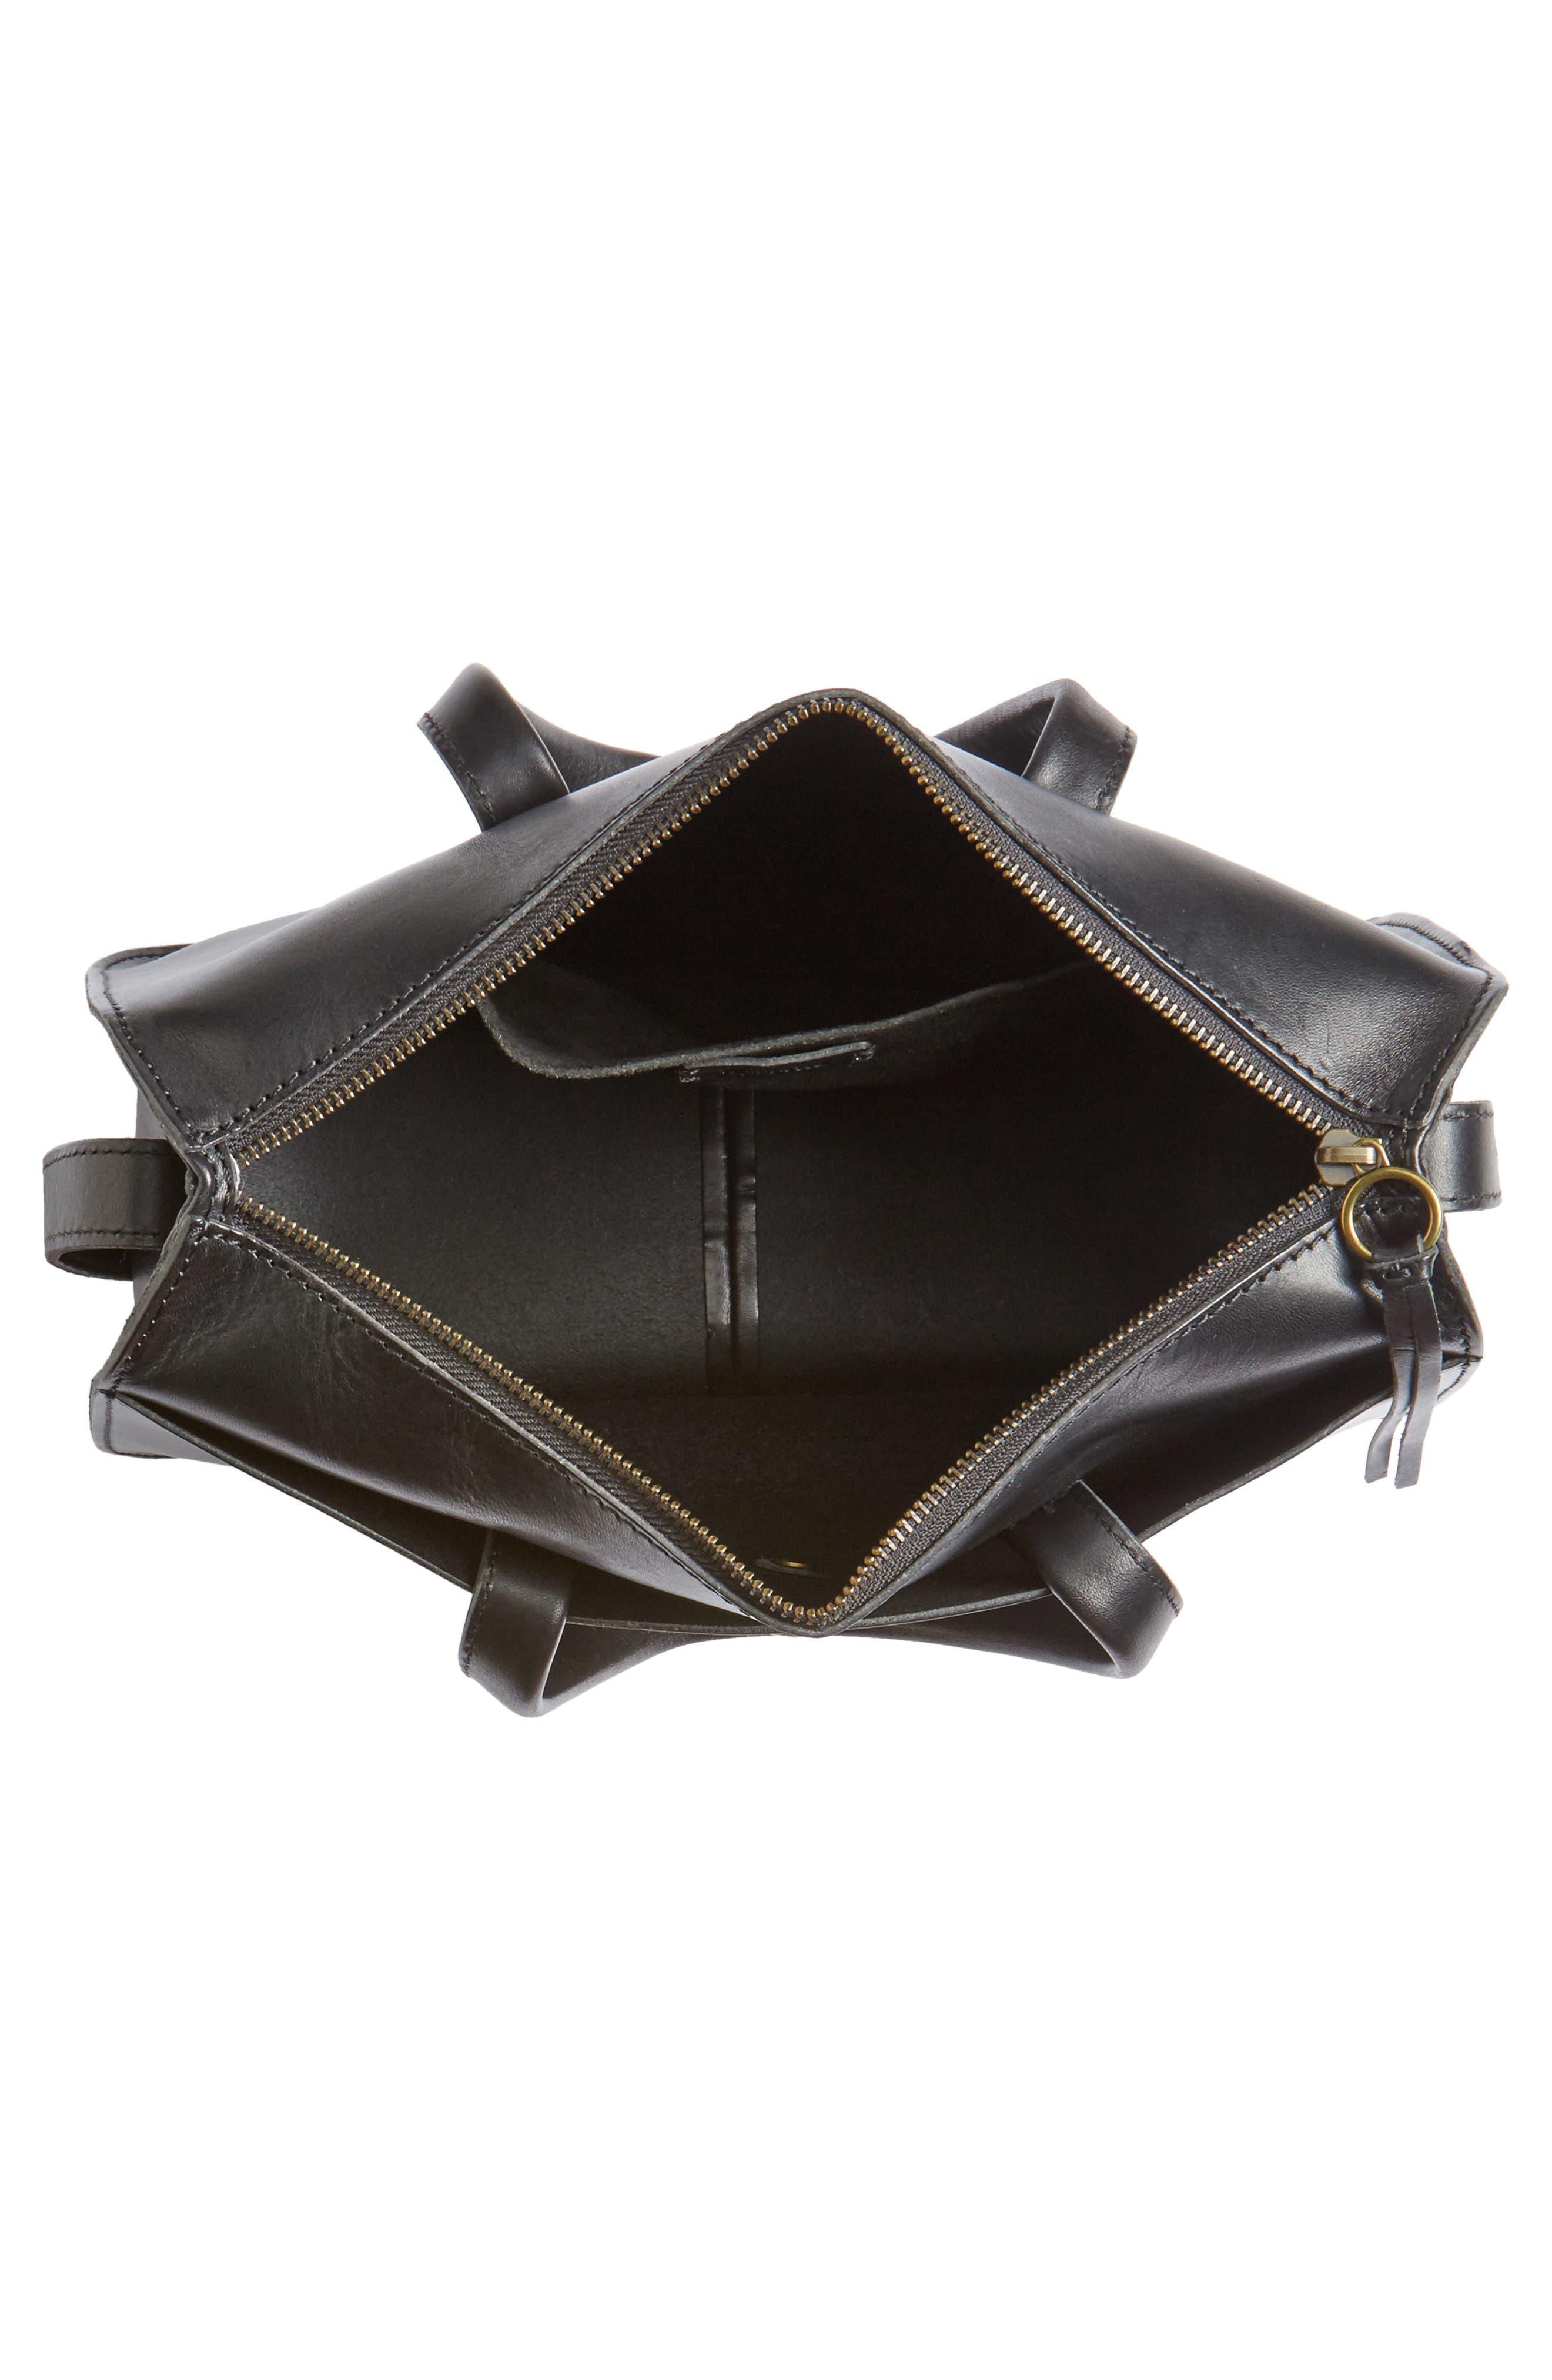 Montreal Leather Satchel,                             Alternate thumbnail 4, color,                             001